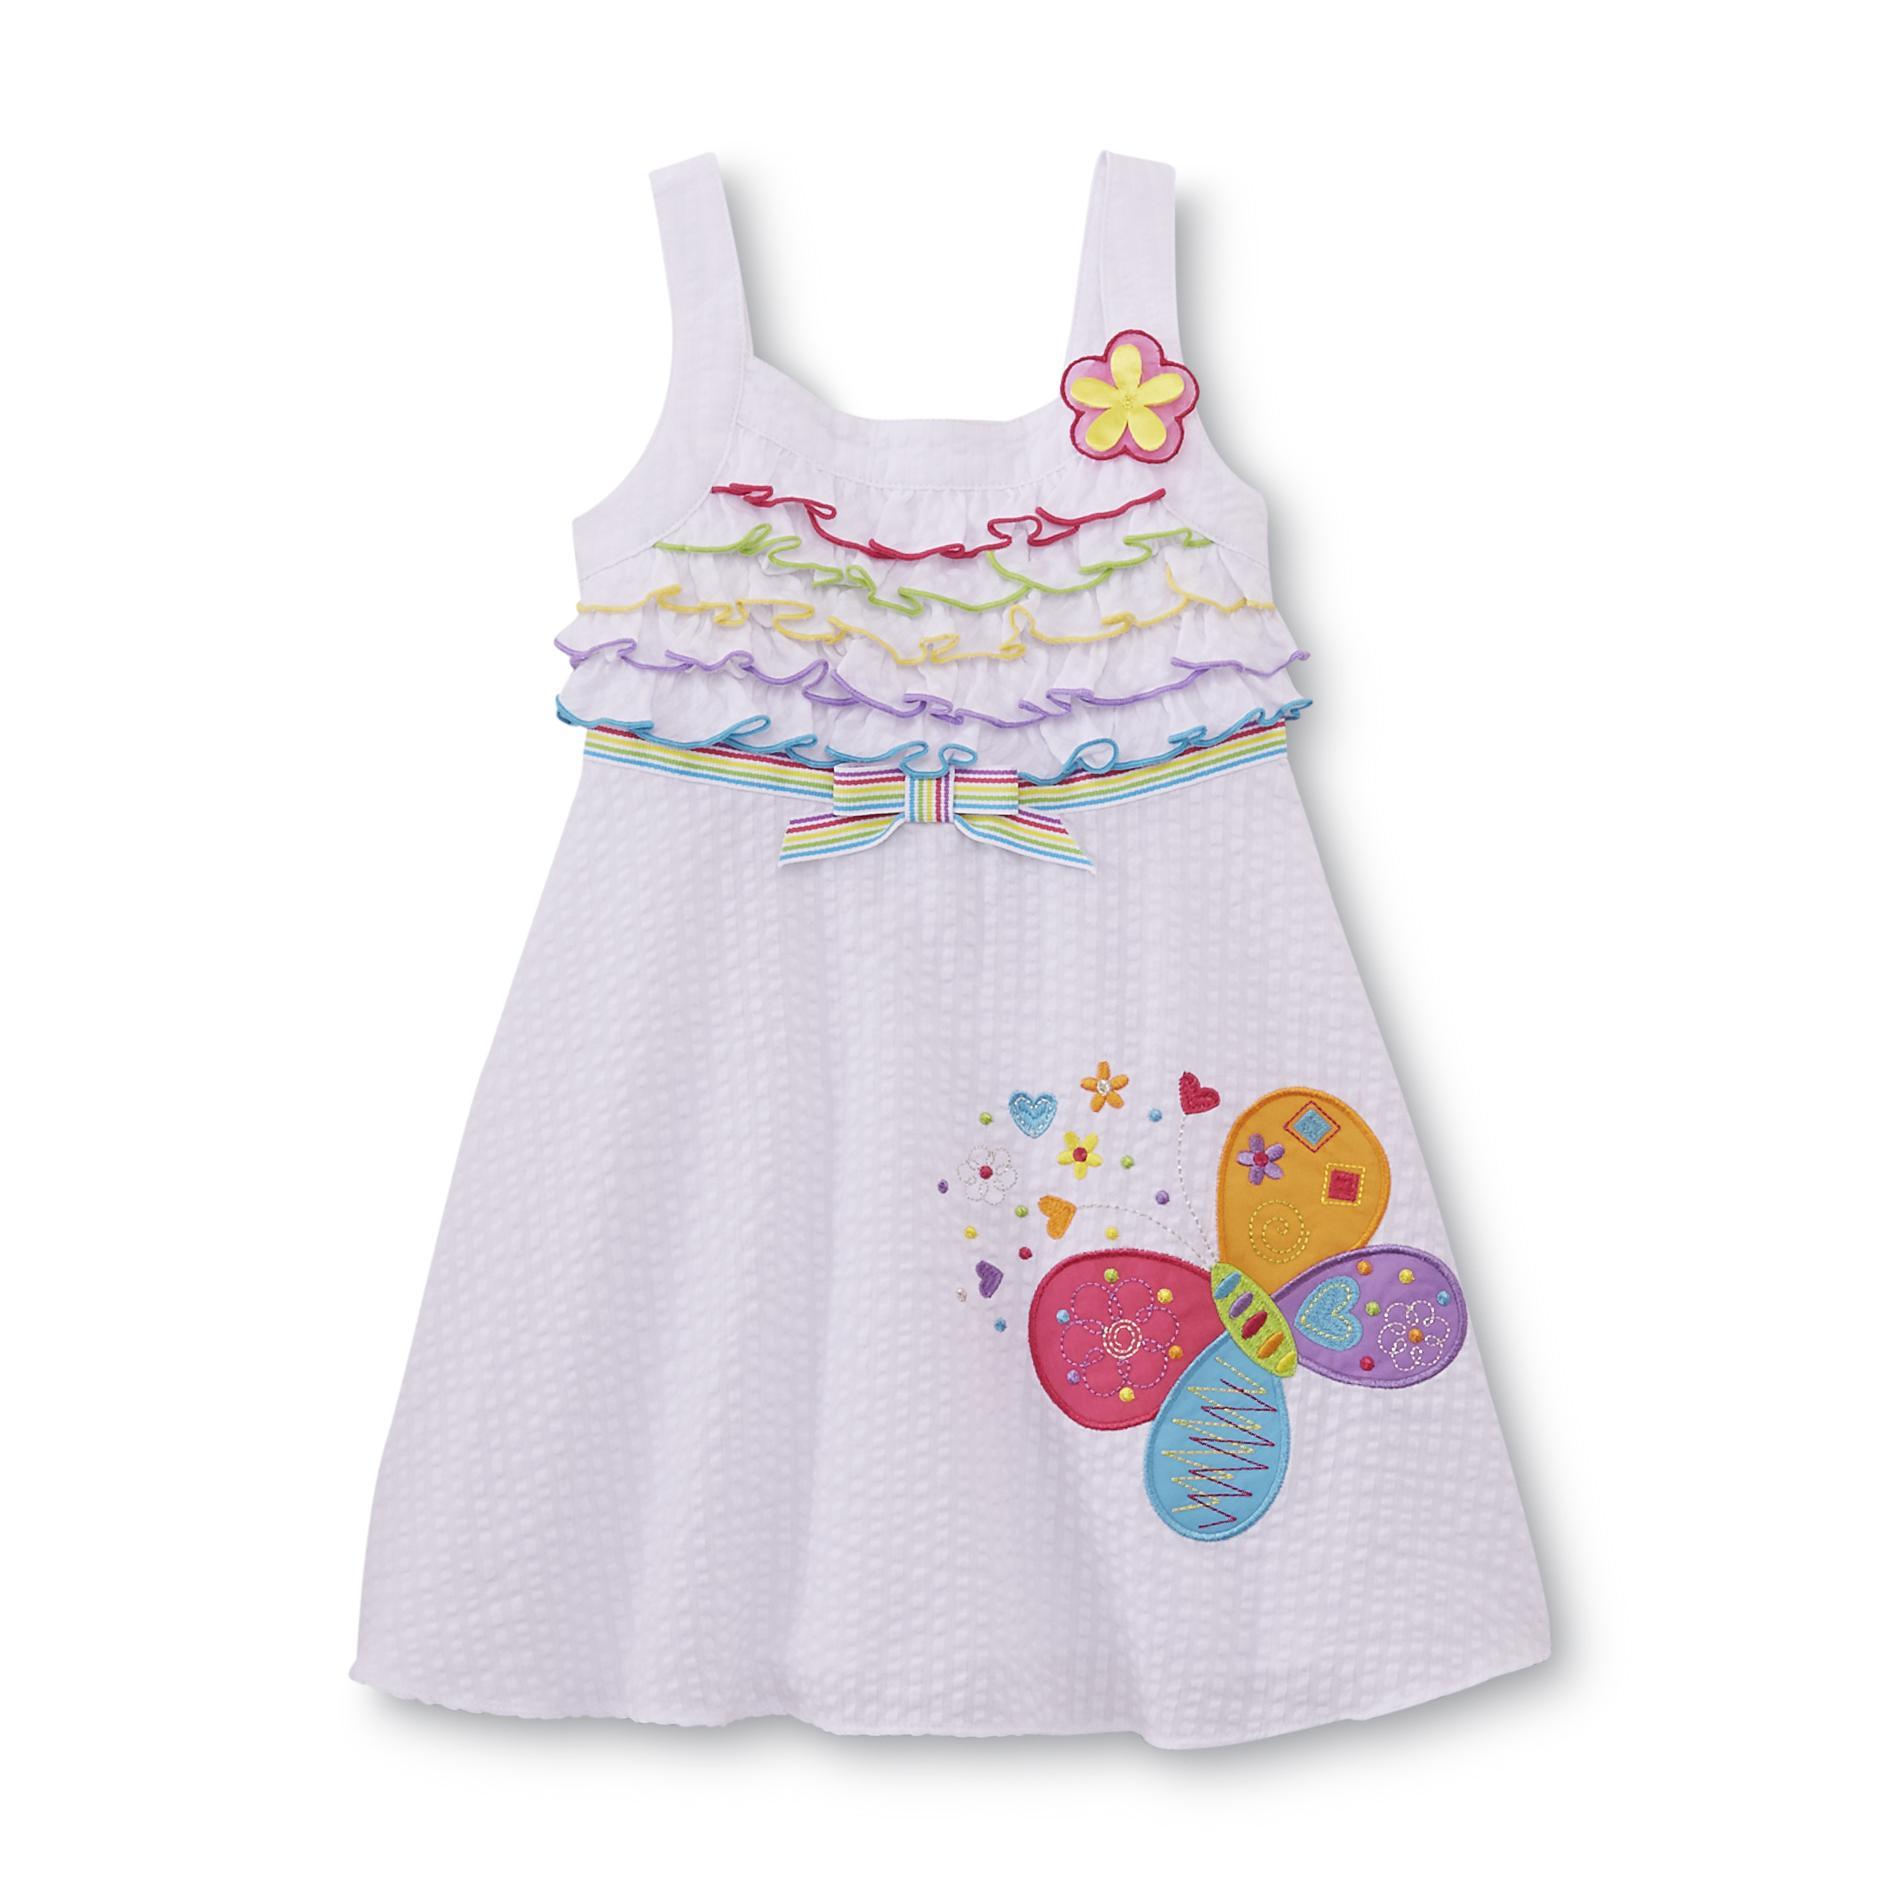 Youngland Infant & Toddler Girl's Seersucker Sundress